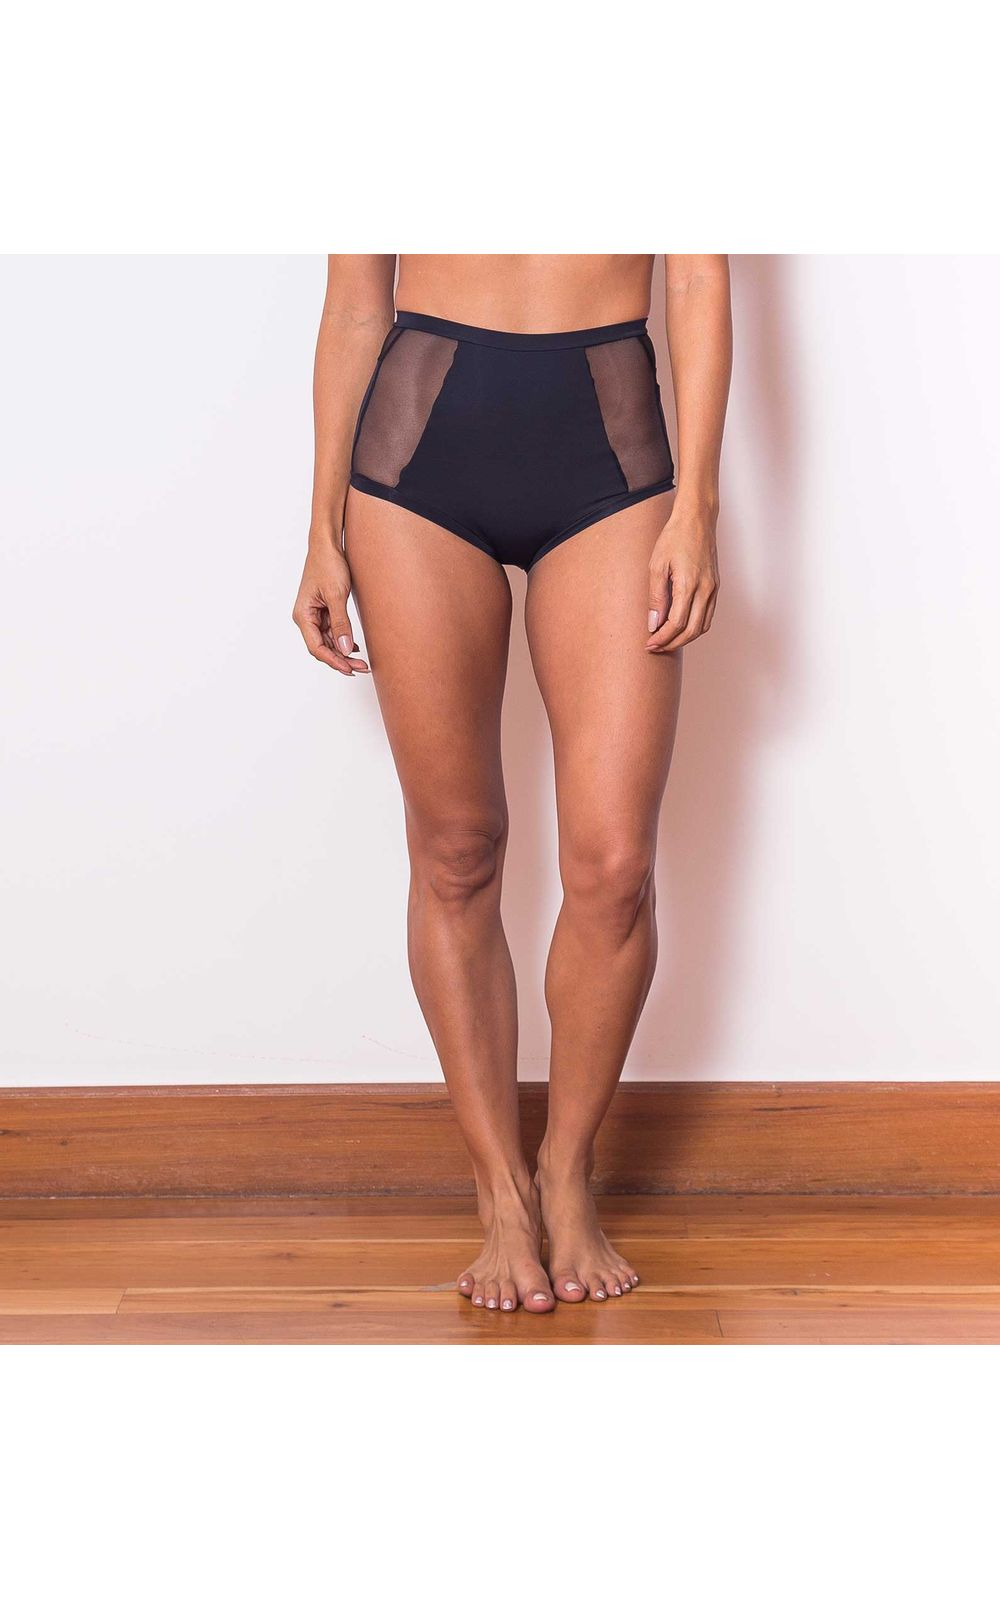 Foto 3 - Calcinha Hot Pants Tech Pro Tule Preta